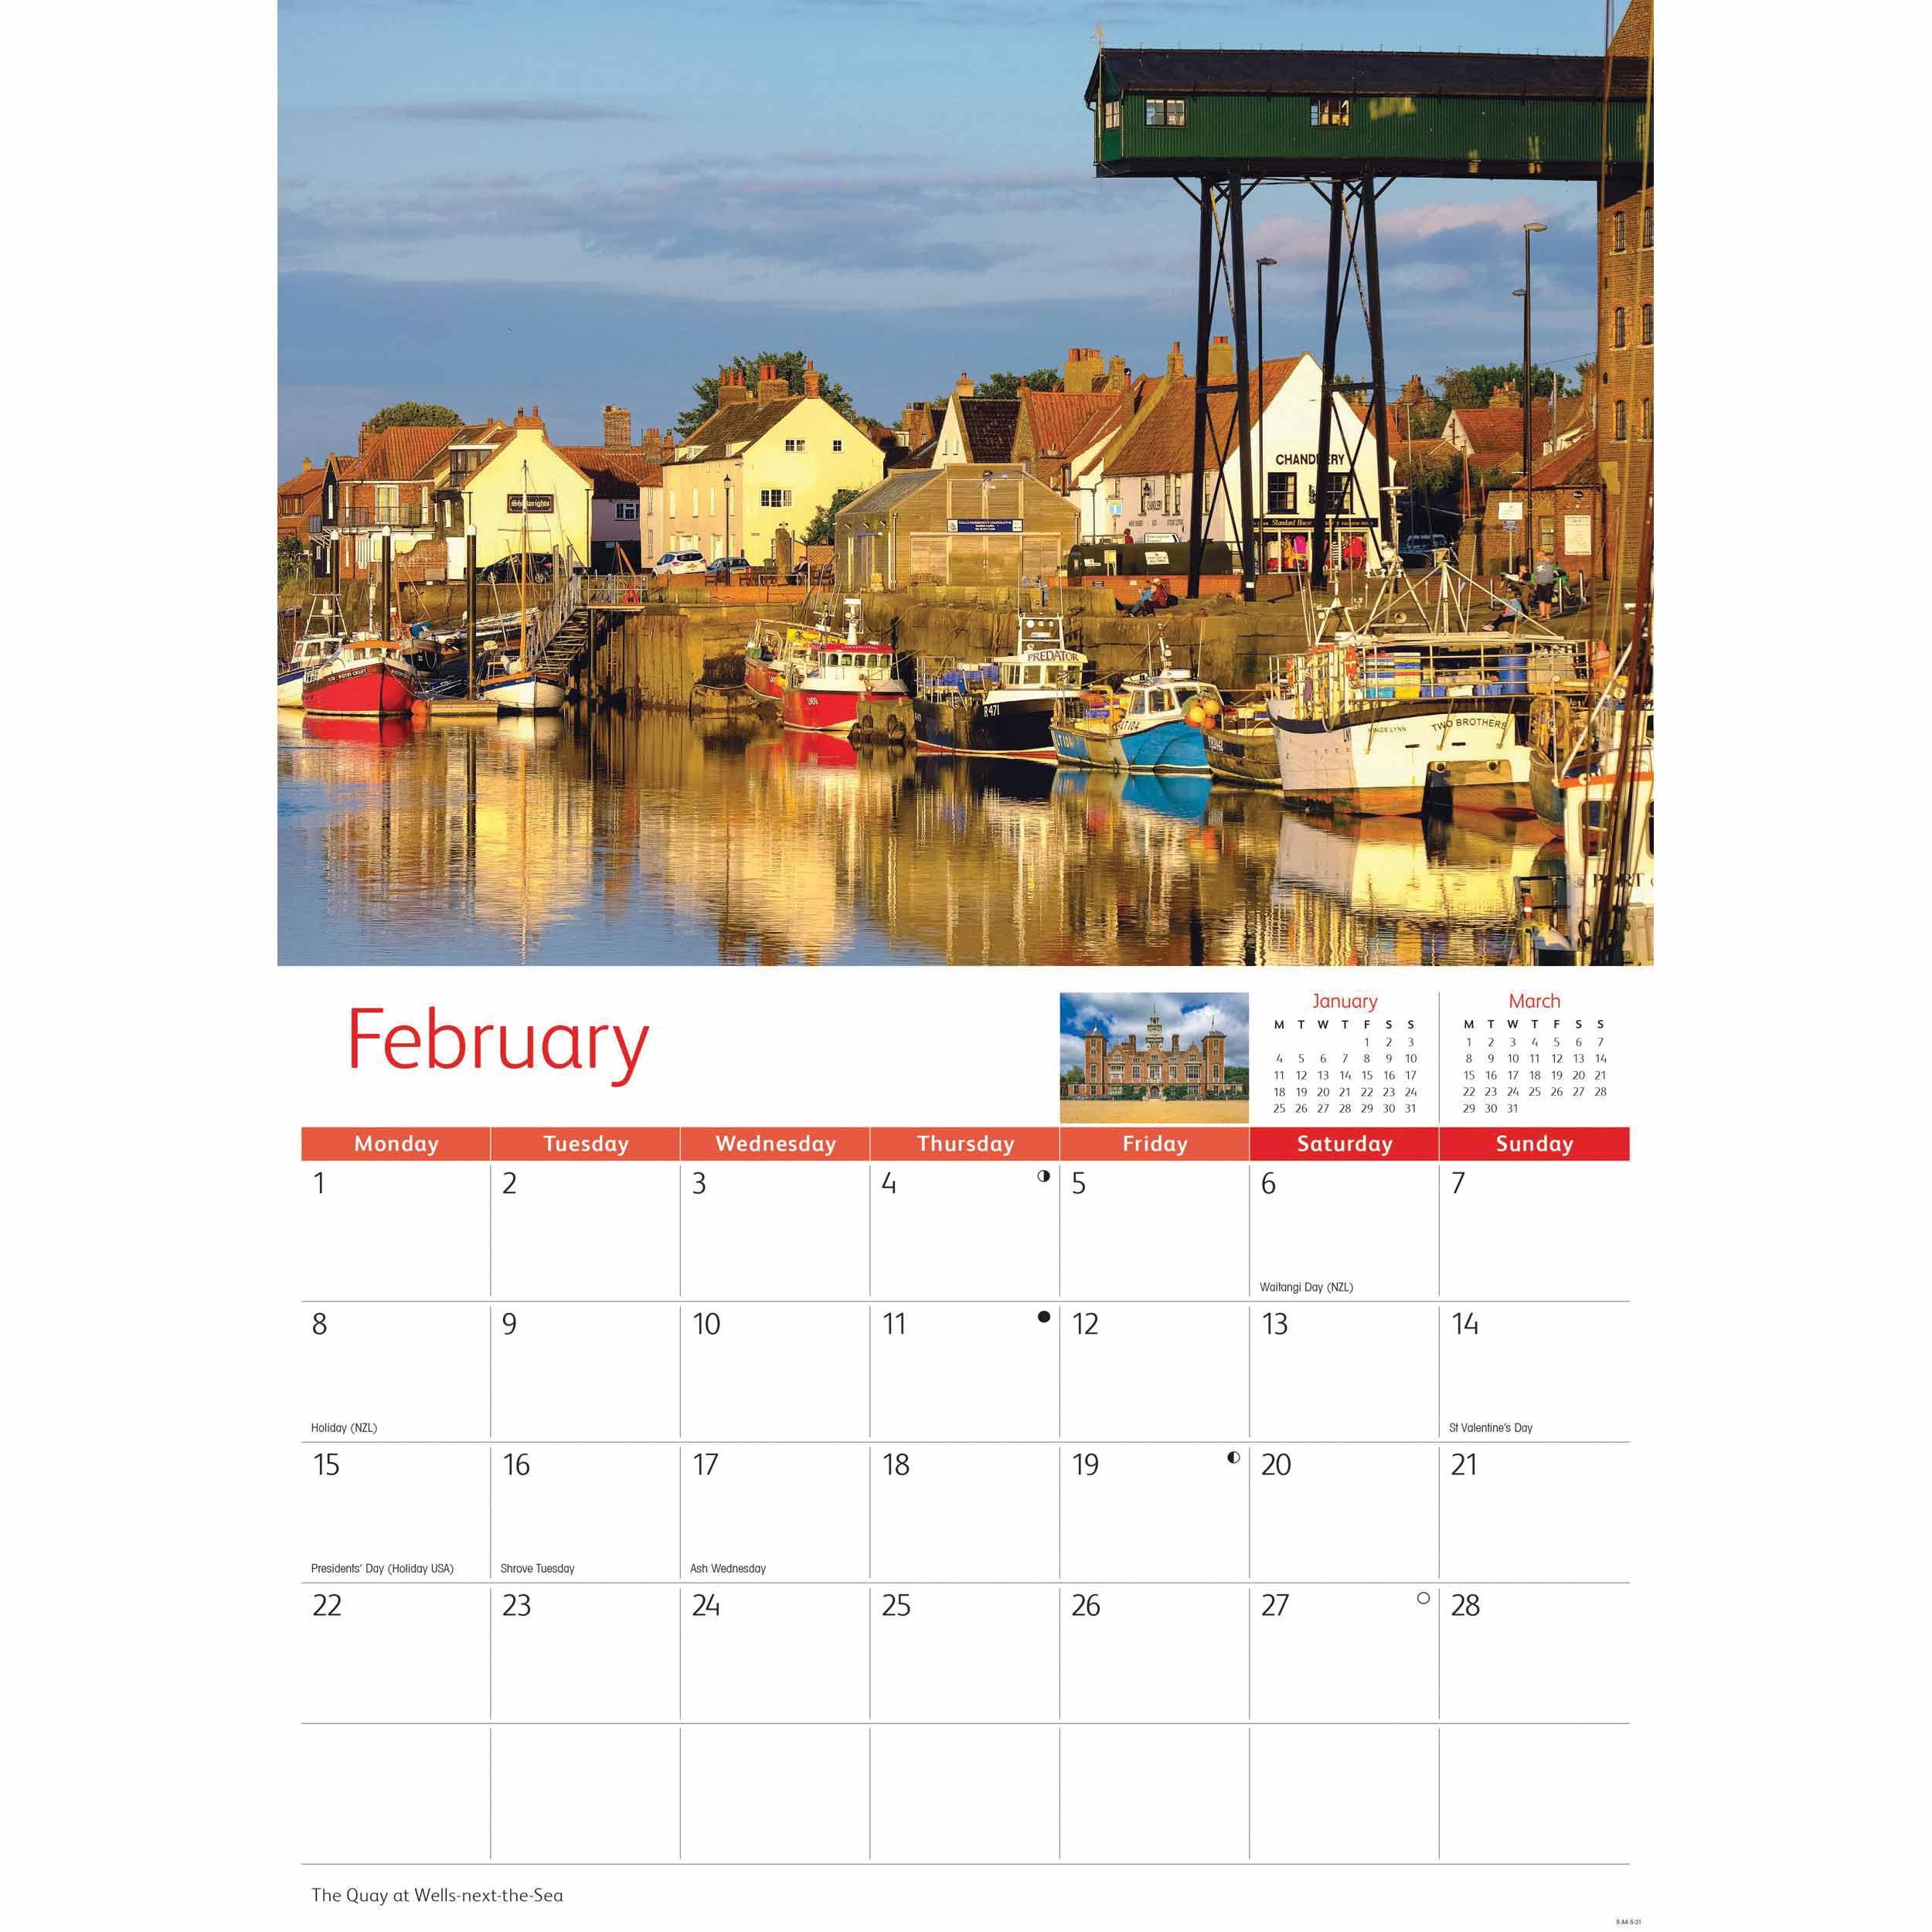 Norfolk A4 Calendar 2021 At Calendar Club